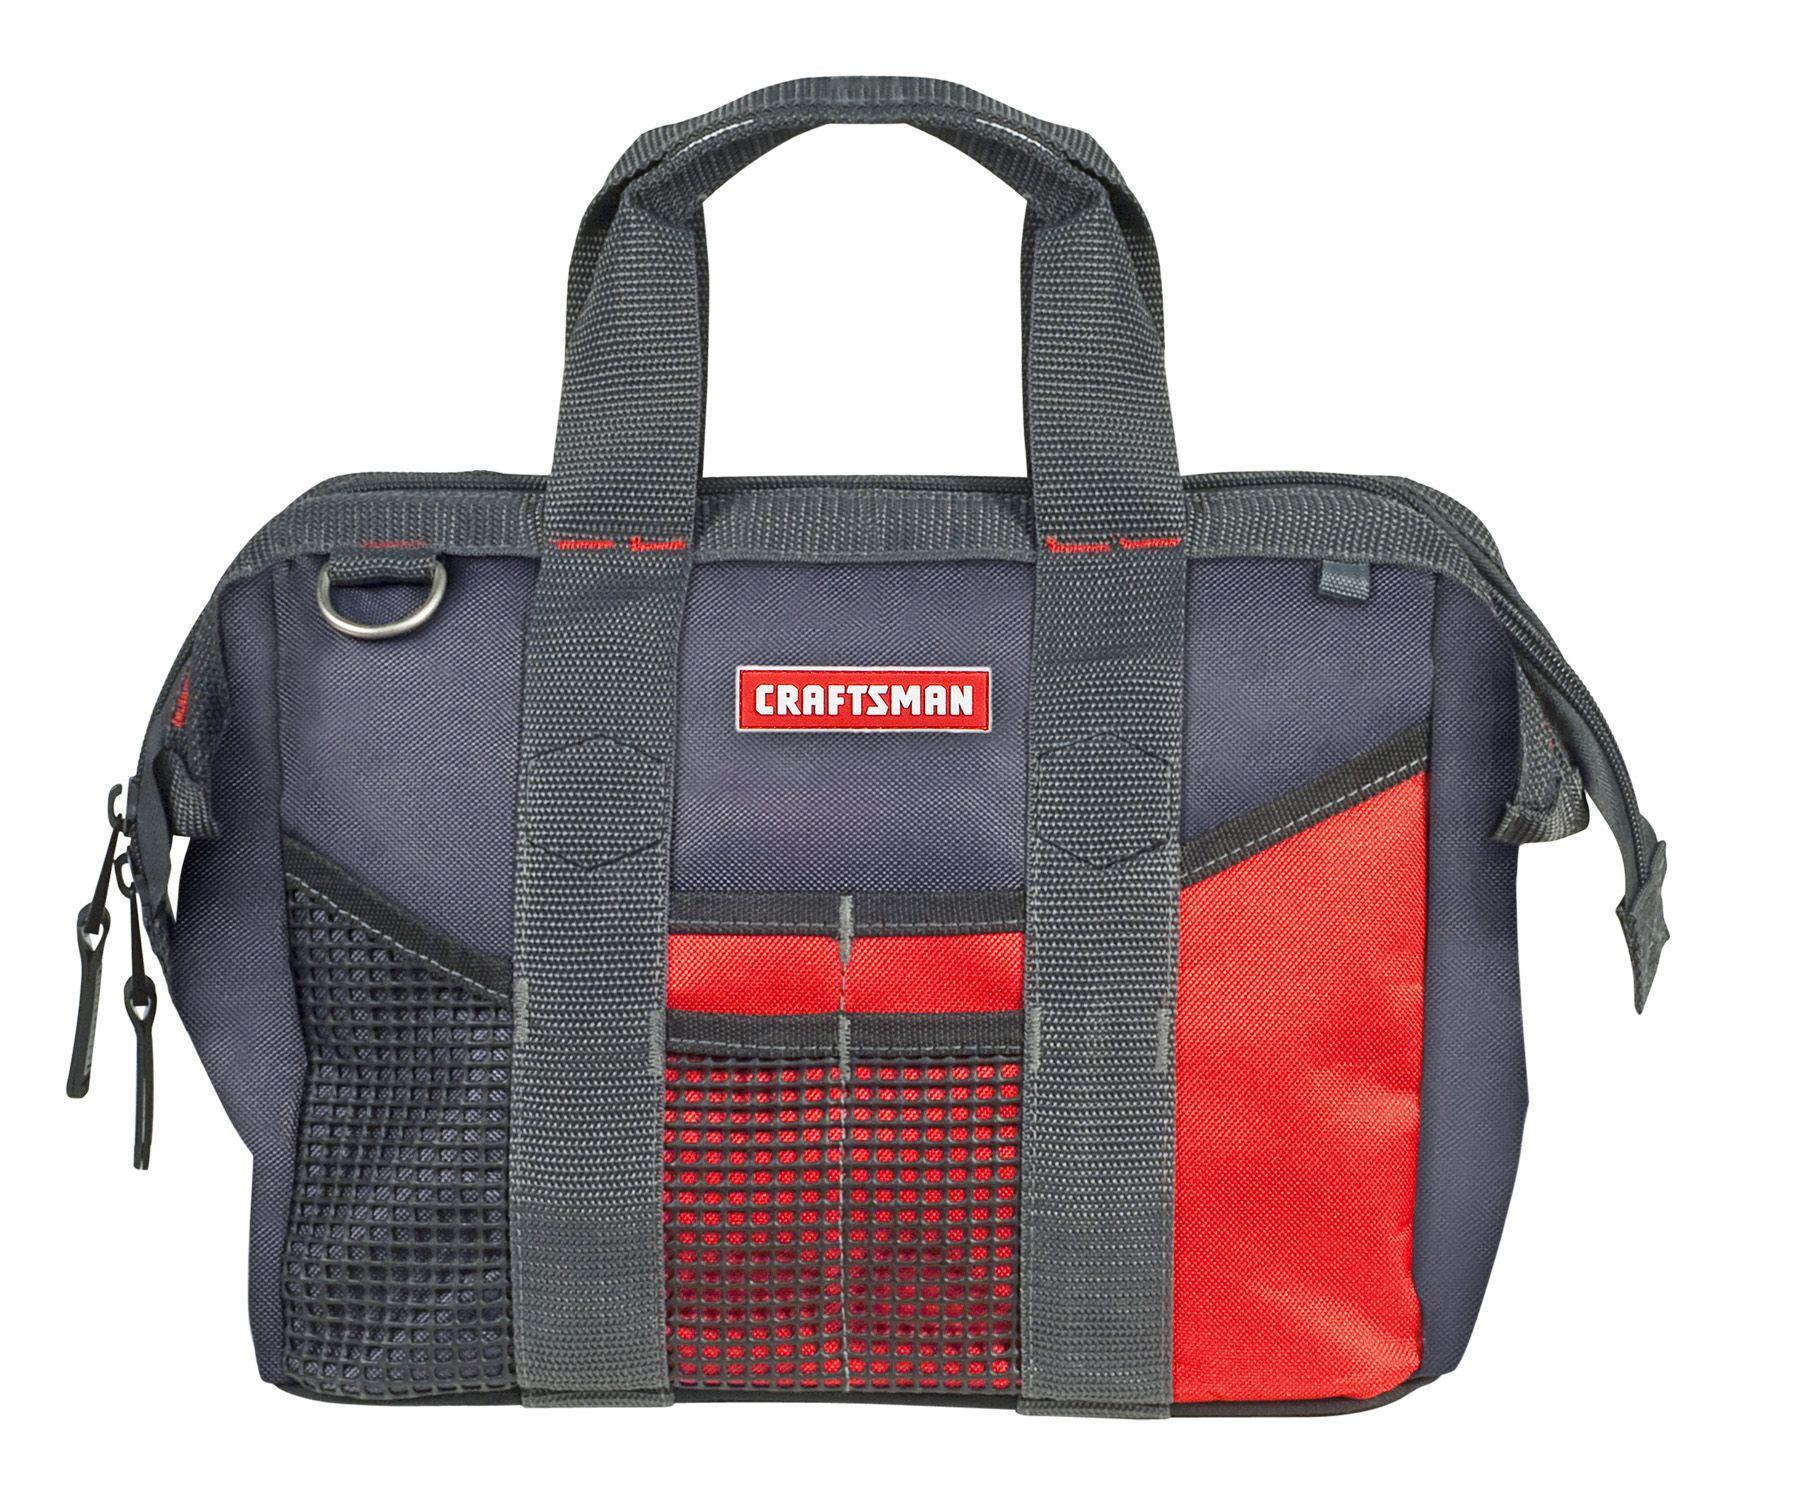 Craftsman Large Mouth Tool Bag - 12 inch